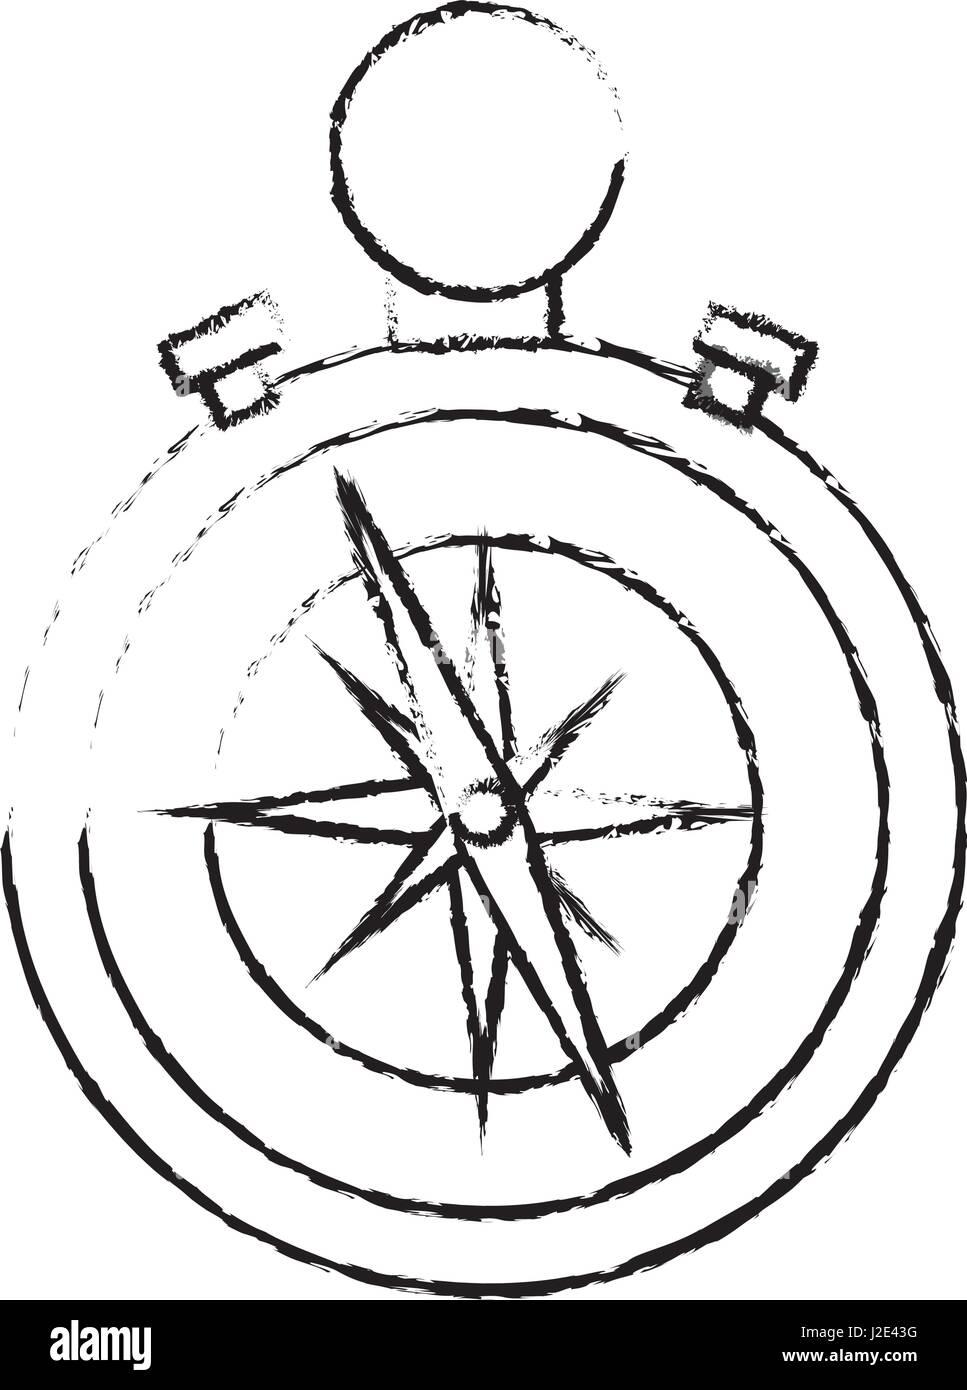 Compass navigation tool - Stock Image